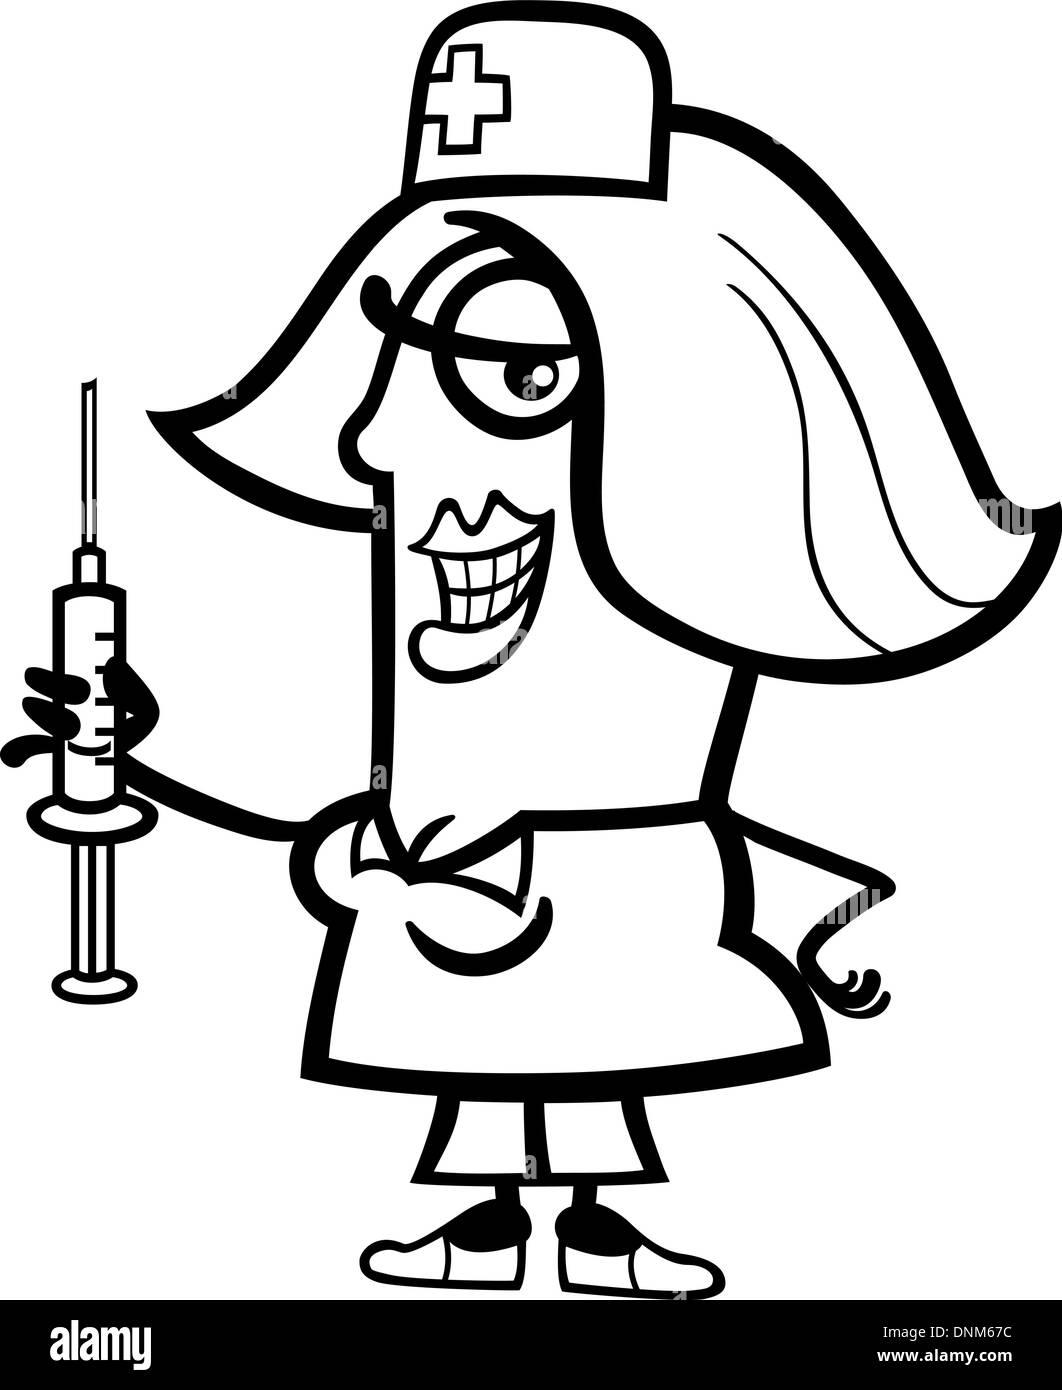 black and white cartoon illustration of funny female nurse